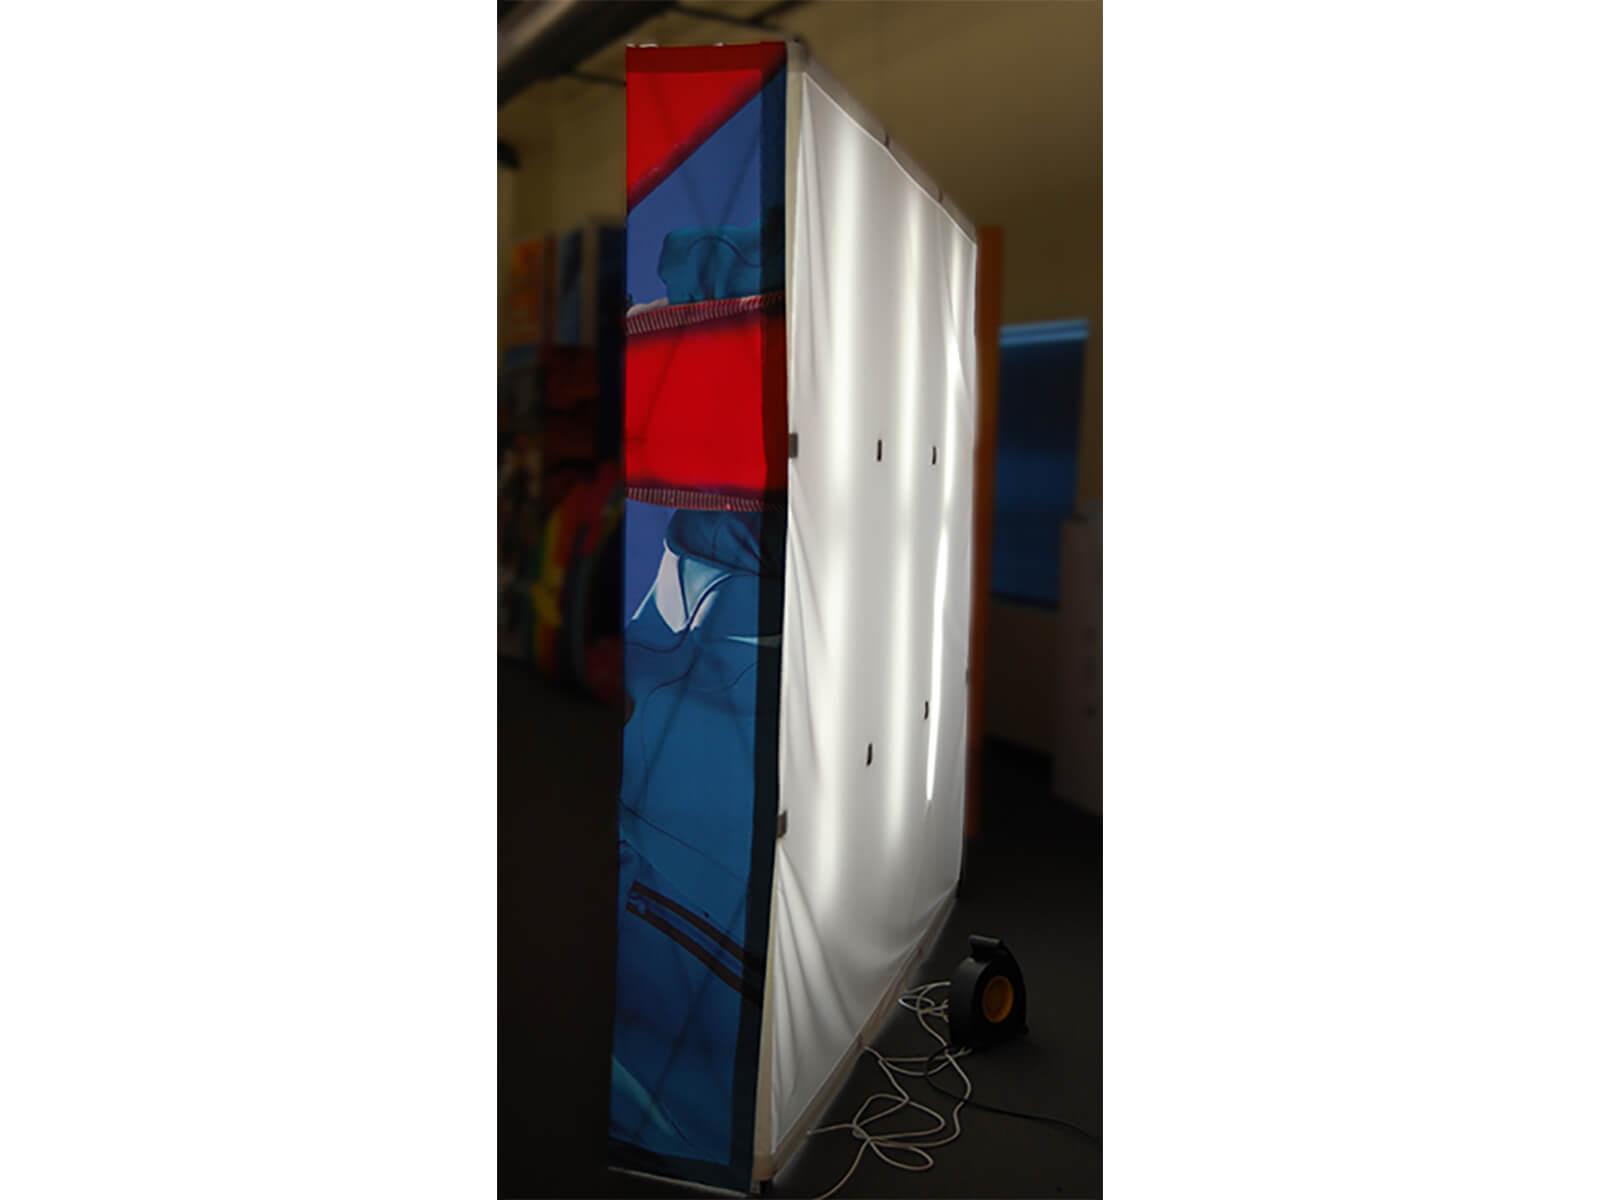 VBurst 8ft Kit Flat BACKLIT 10ft x 10ft space